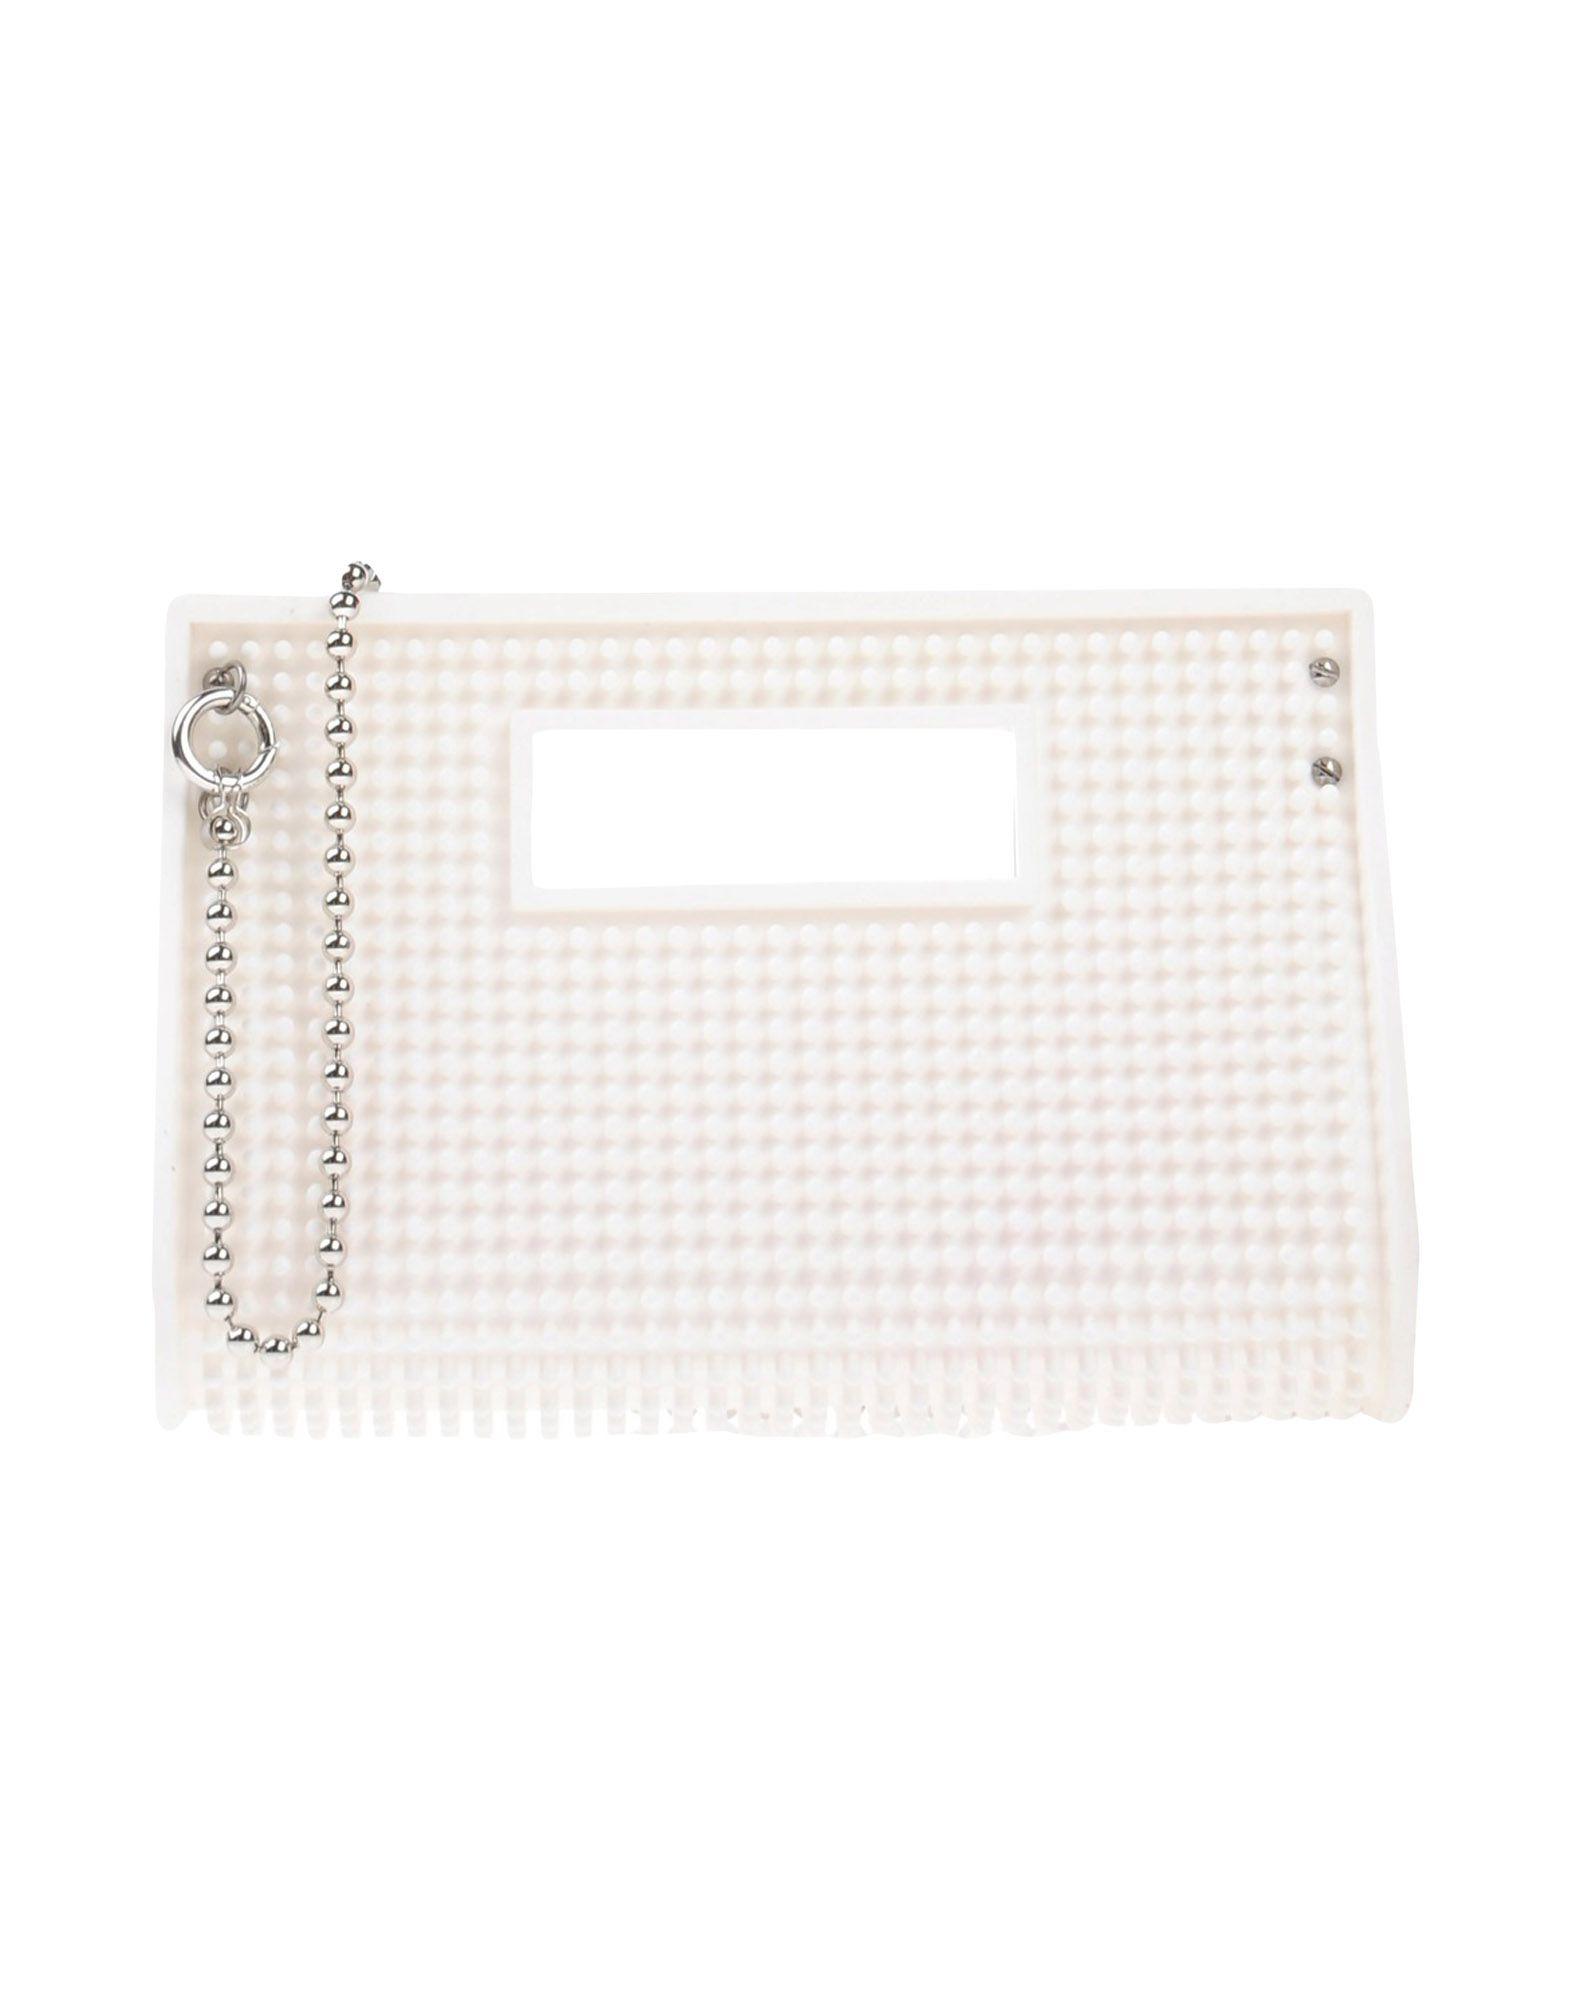 HANDBAGS - Handbags Barmat Nicekicks For Sale jODVFJVw